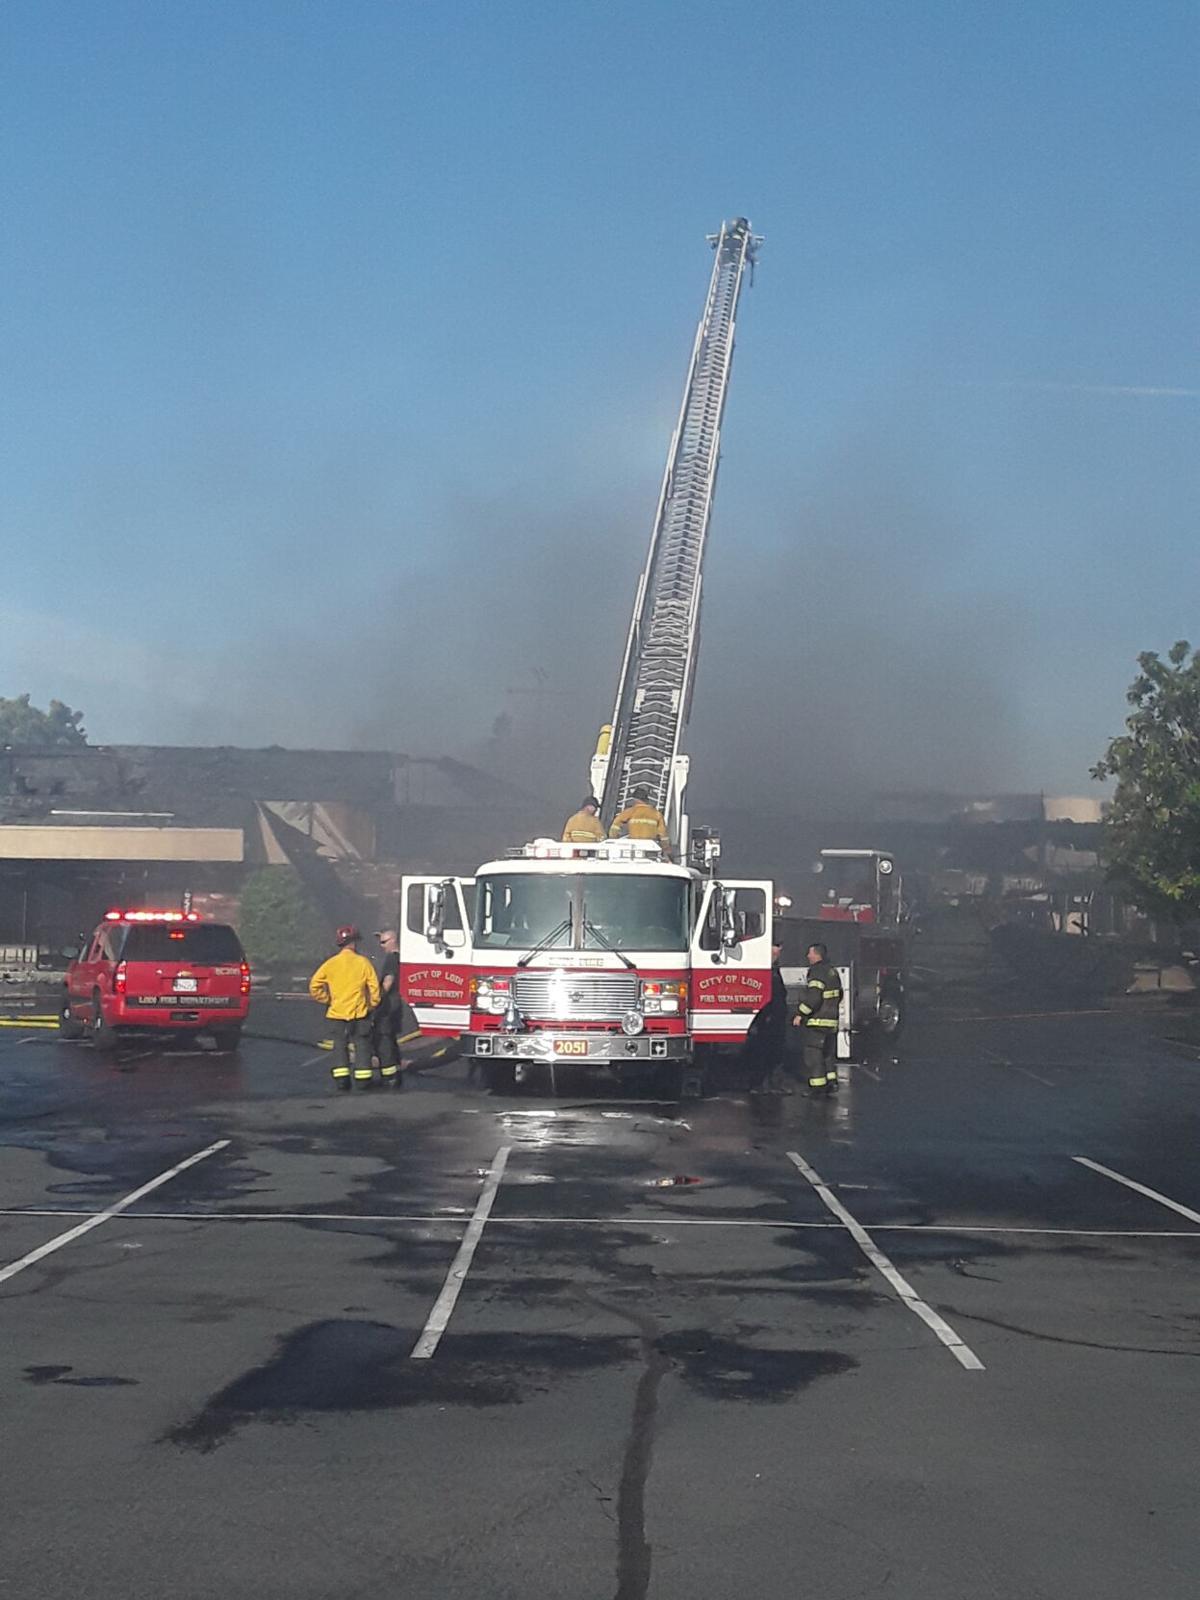 Fire destroys four units at Lodi business plaza